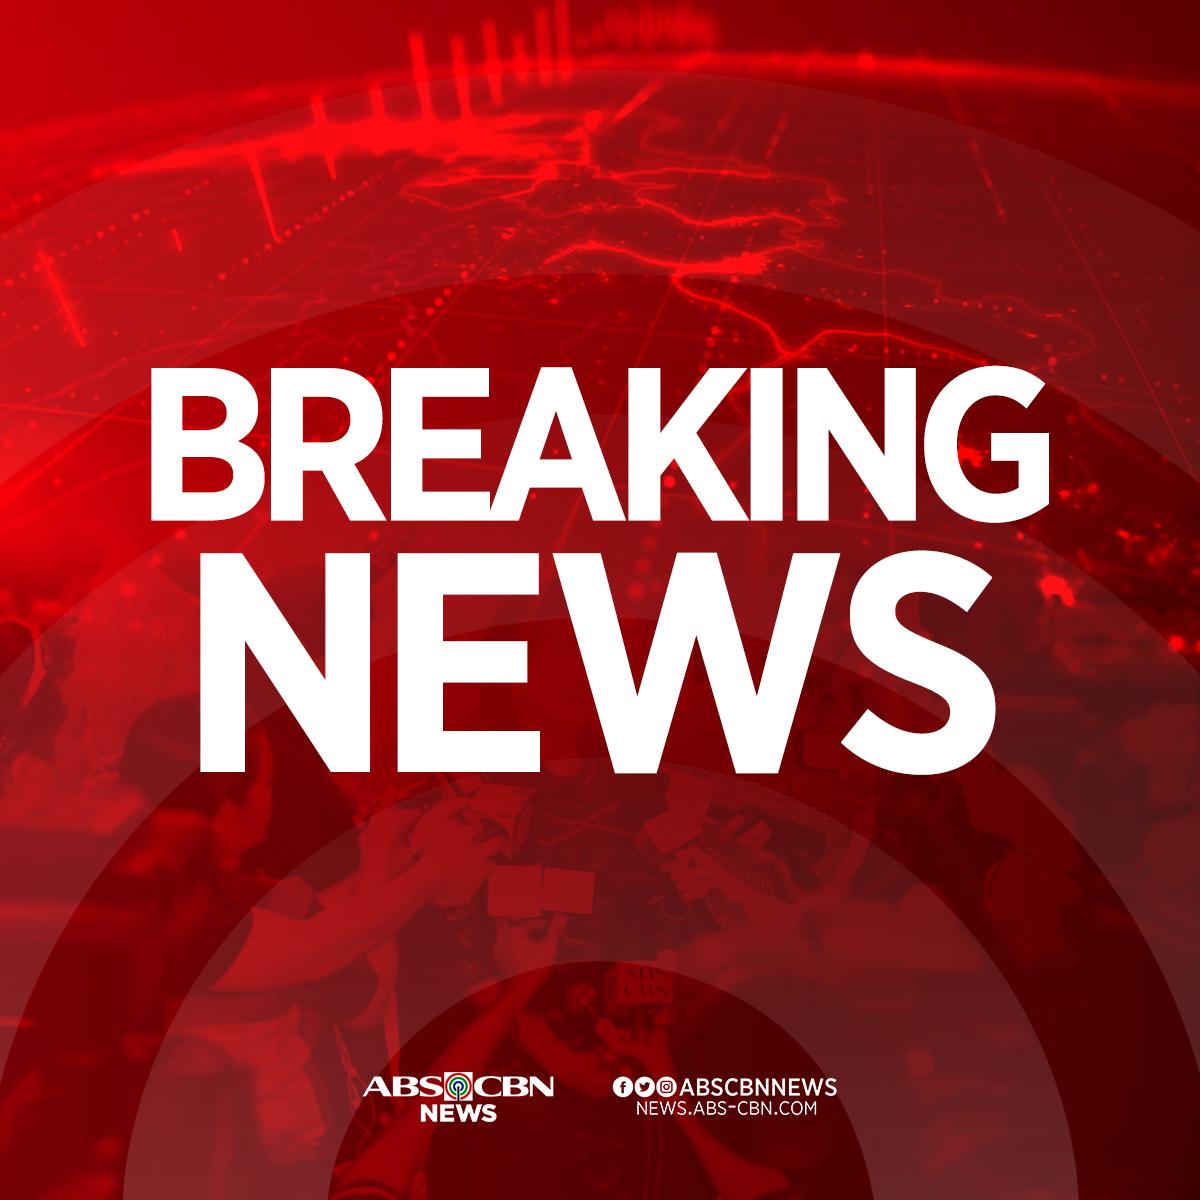 BREAKING: DOH says Philippines now has 2 confirmed 2019-#nCoV cases. #coronavirus